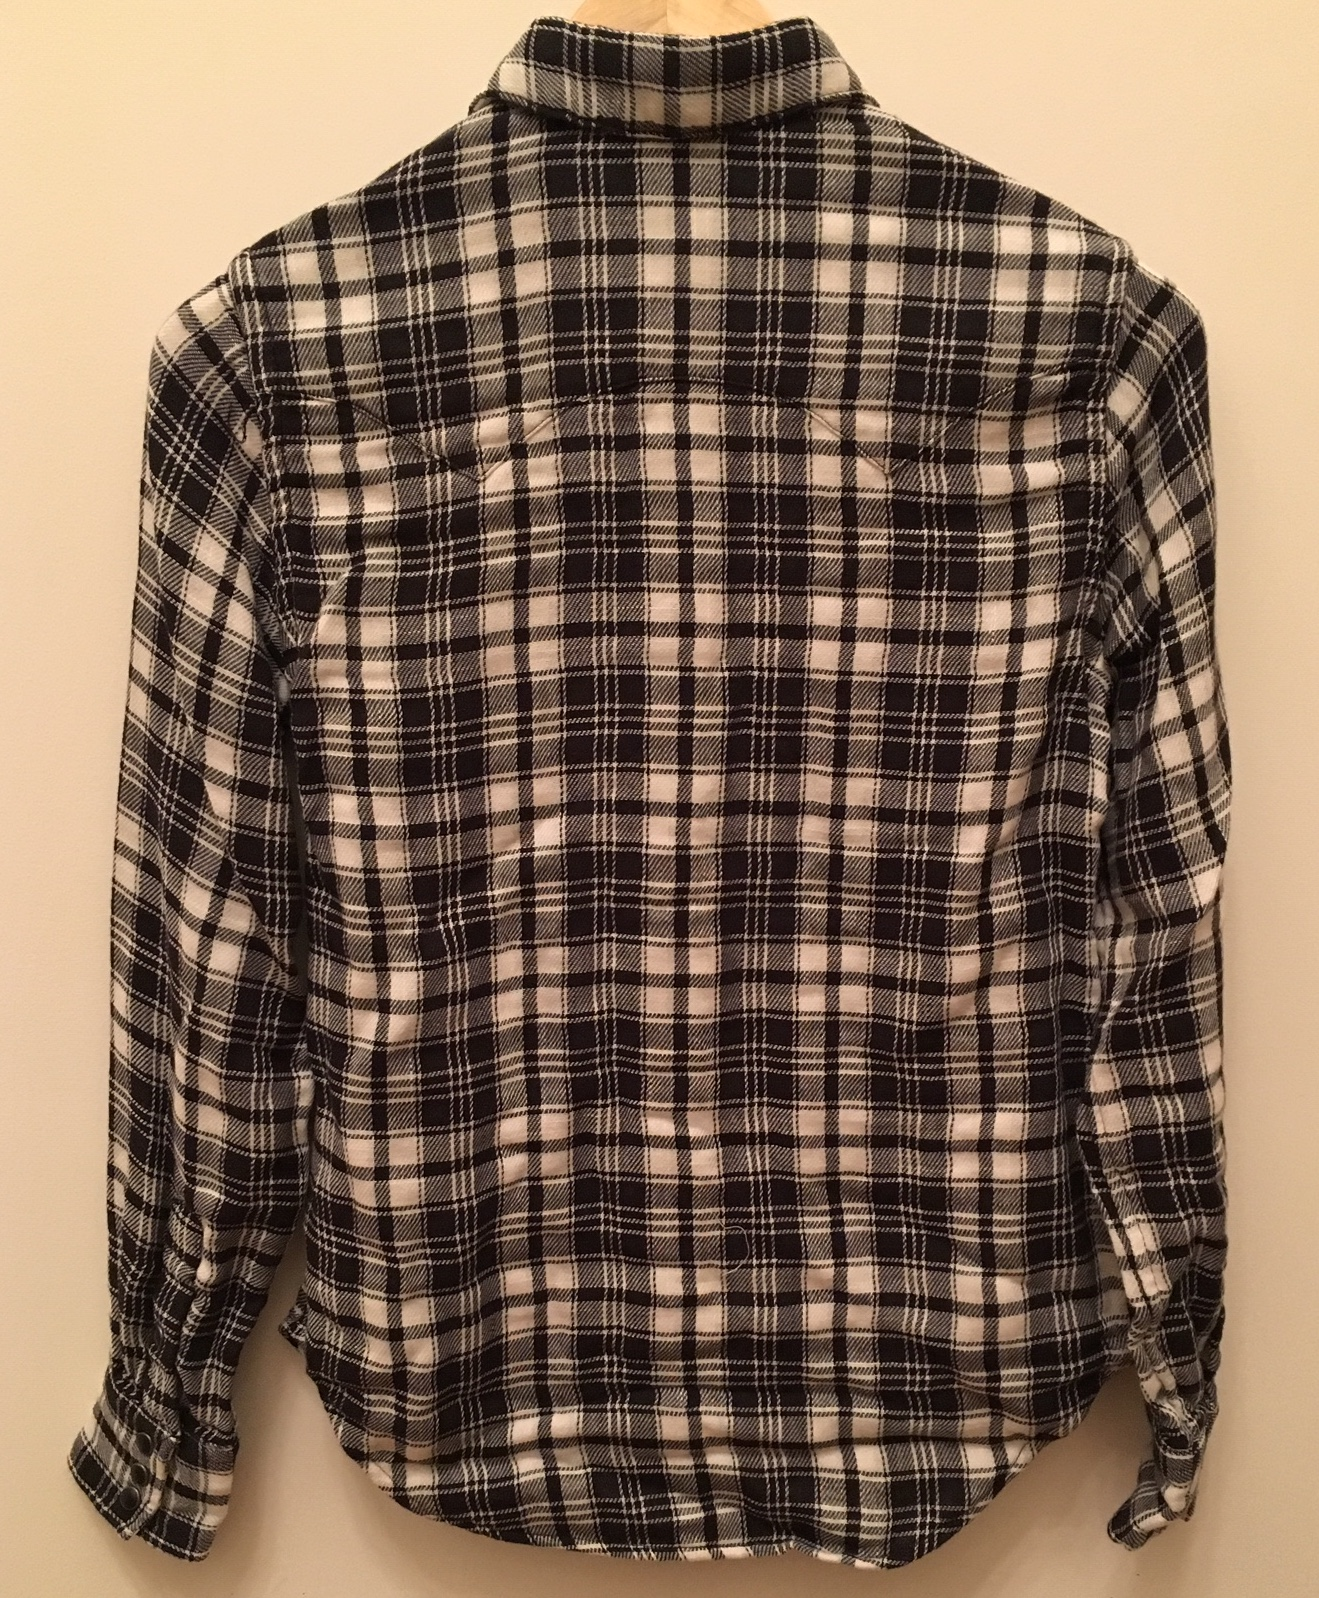 4fbe21b9e3 Polo Ralph Lauren Plaid Western Shirt Slim Fit New NWT MSRP 125